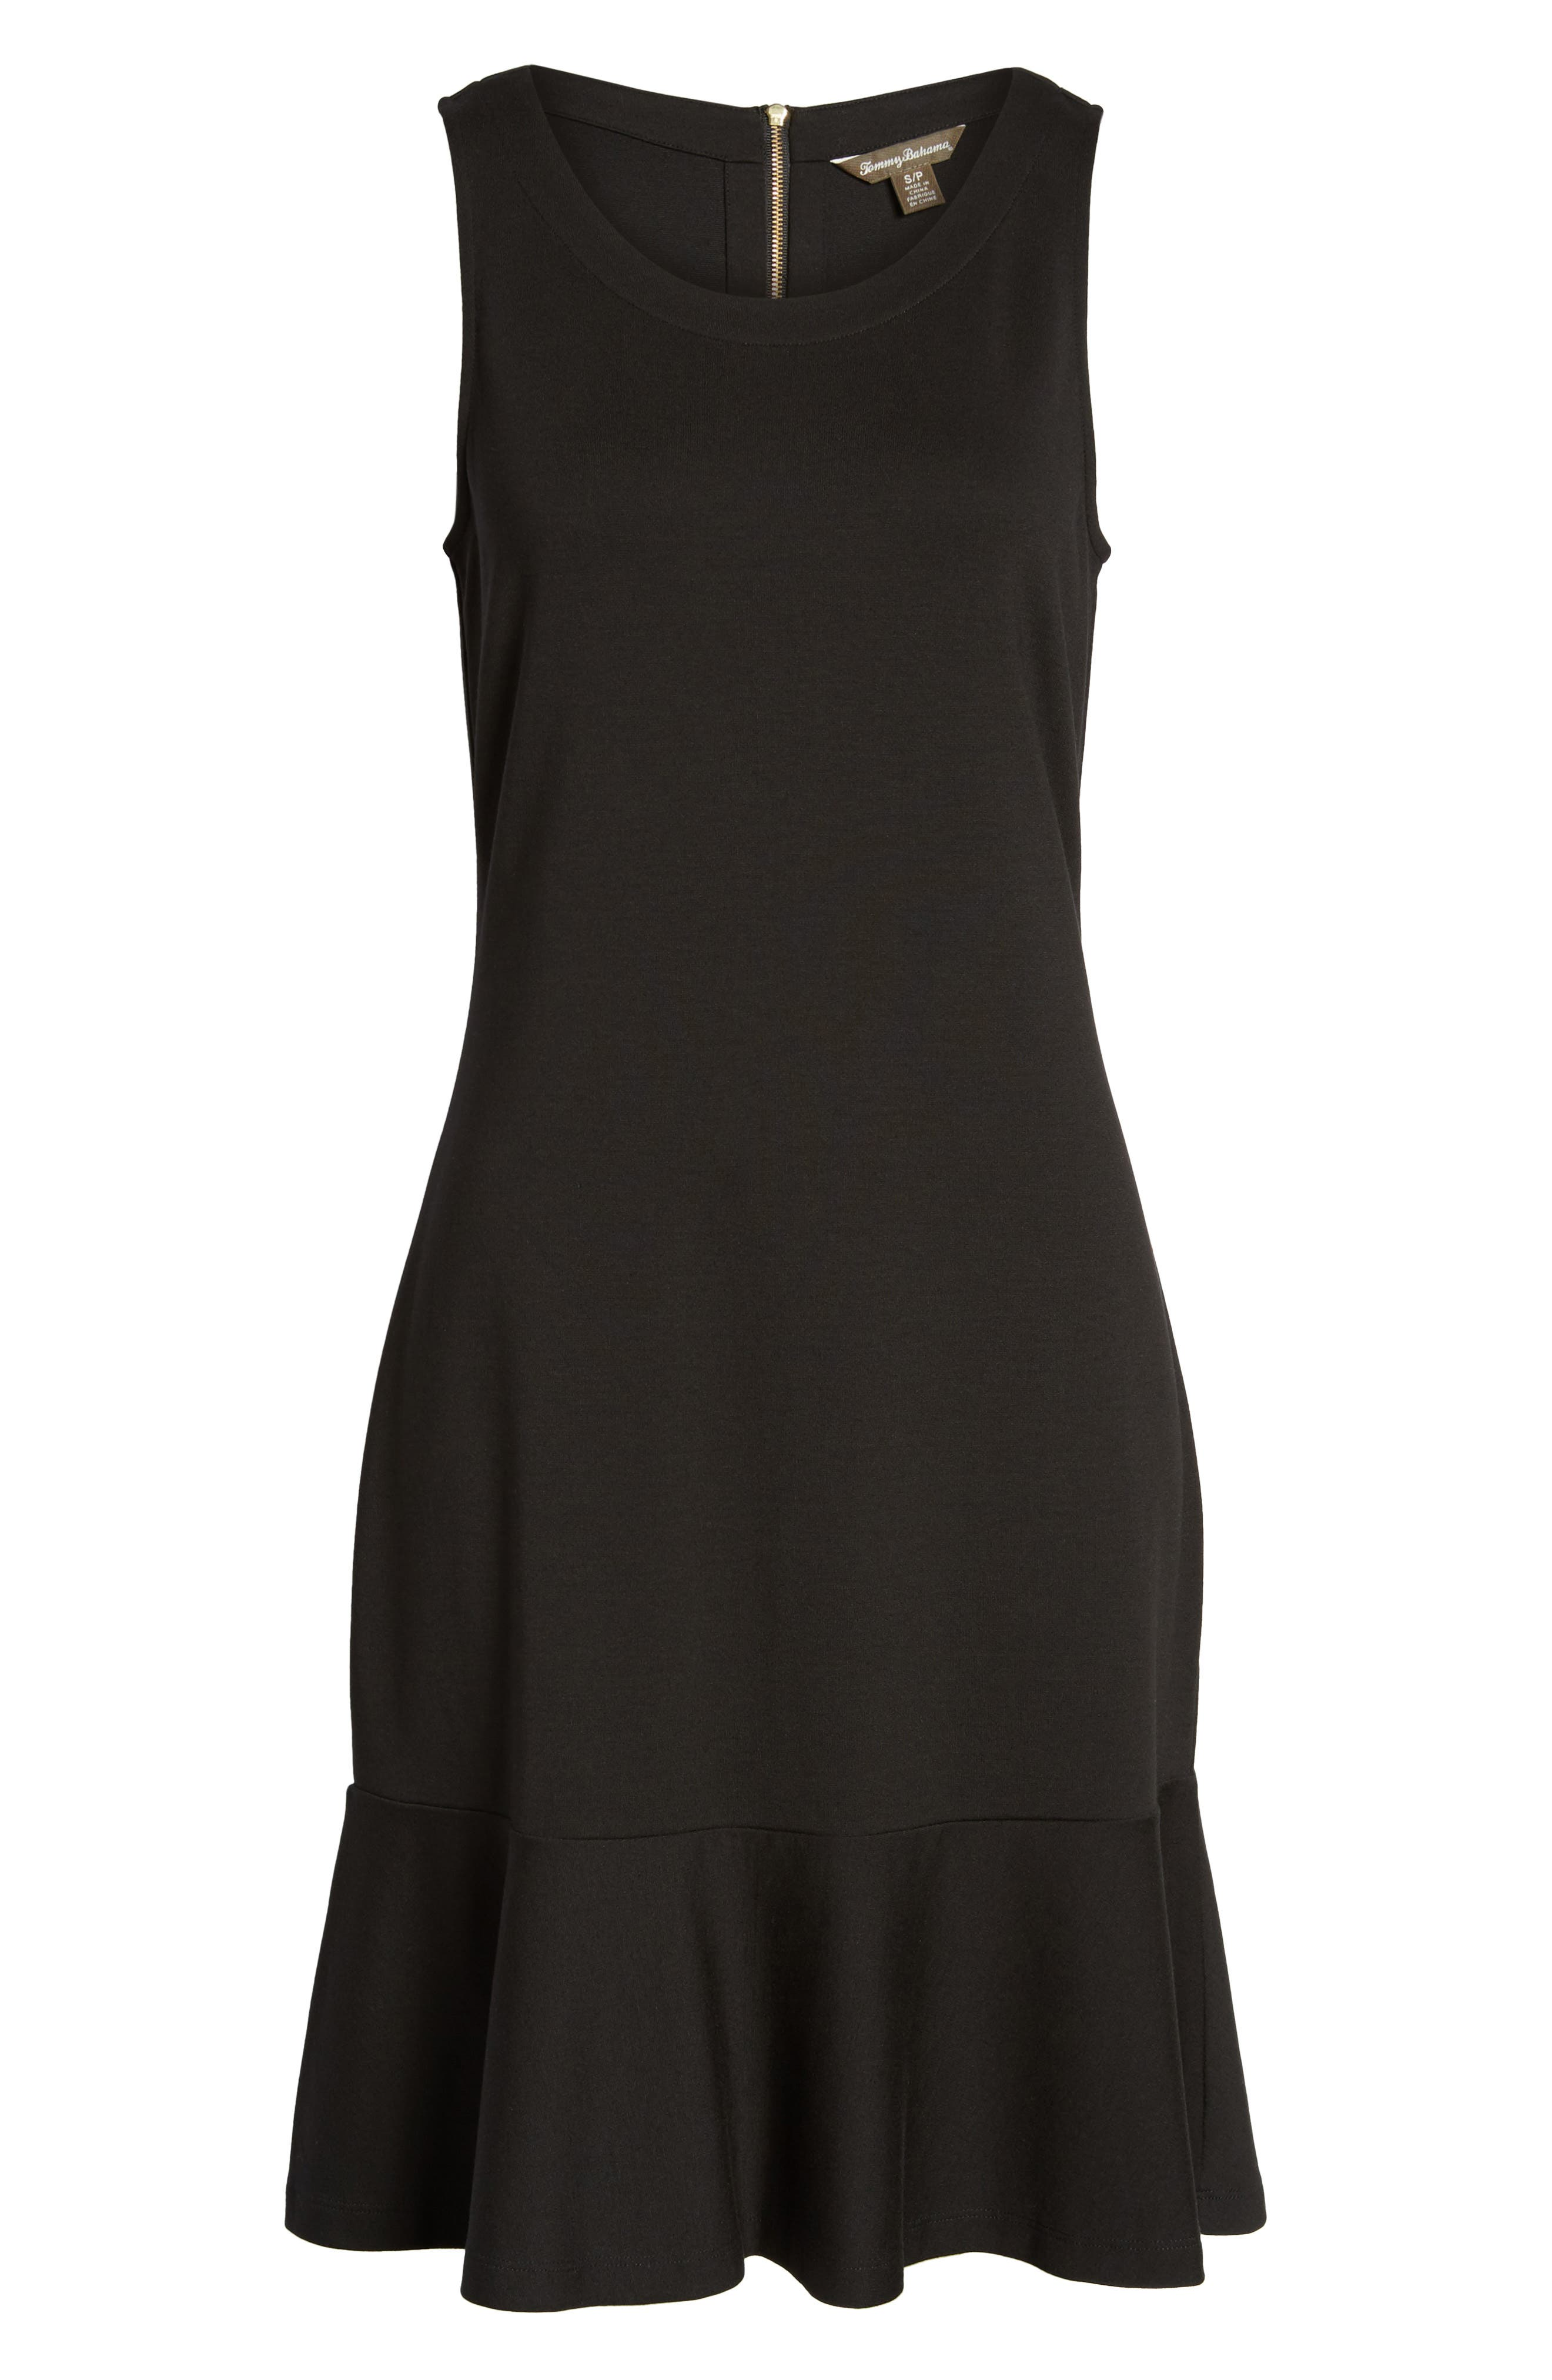 Ponte Knit A-Line Dress,                             Alternate thumbnail 6, color,                             Black